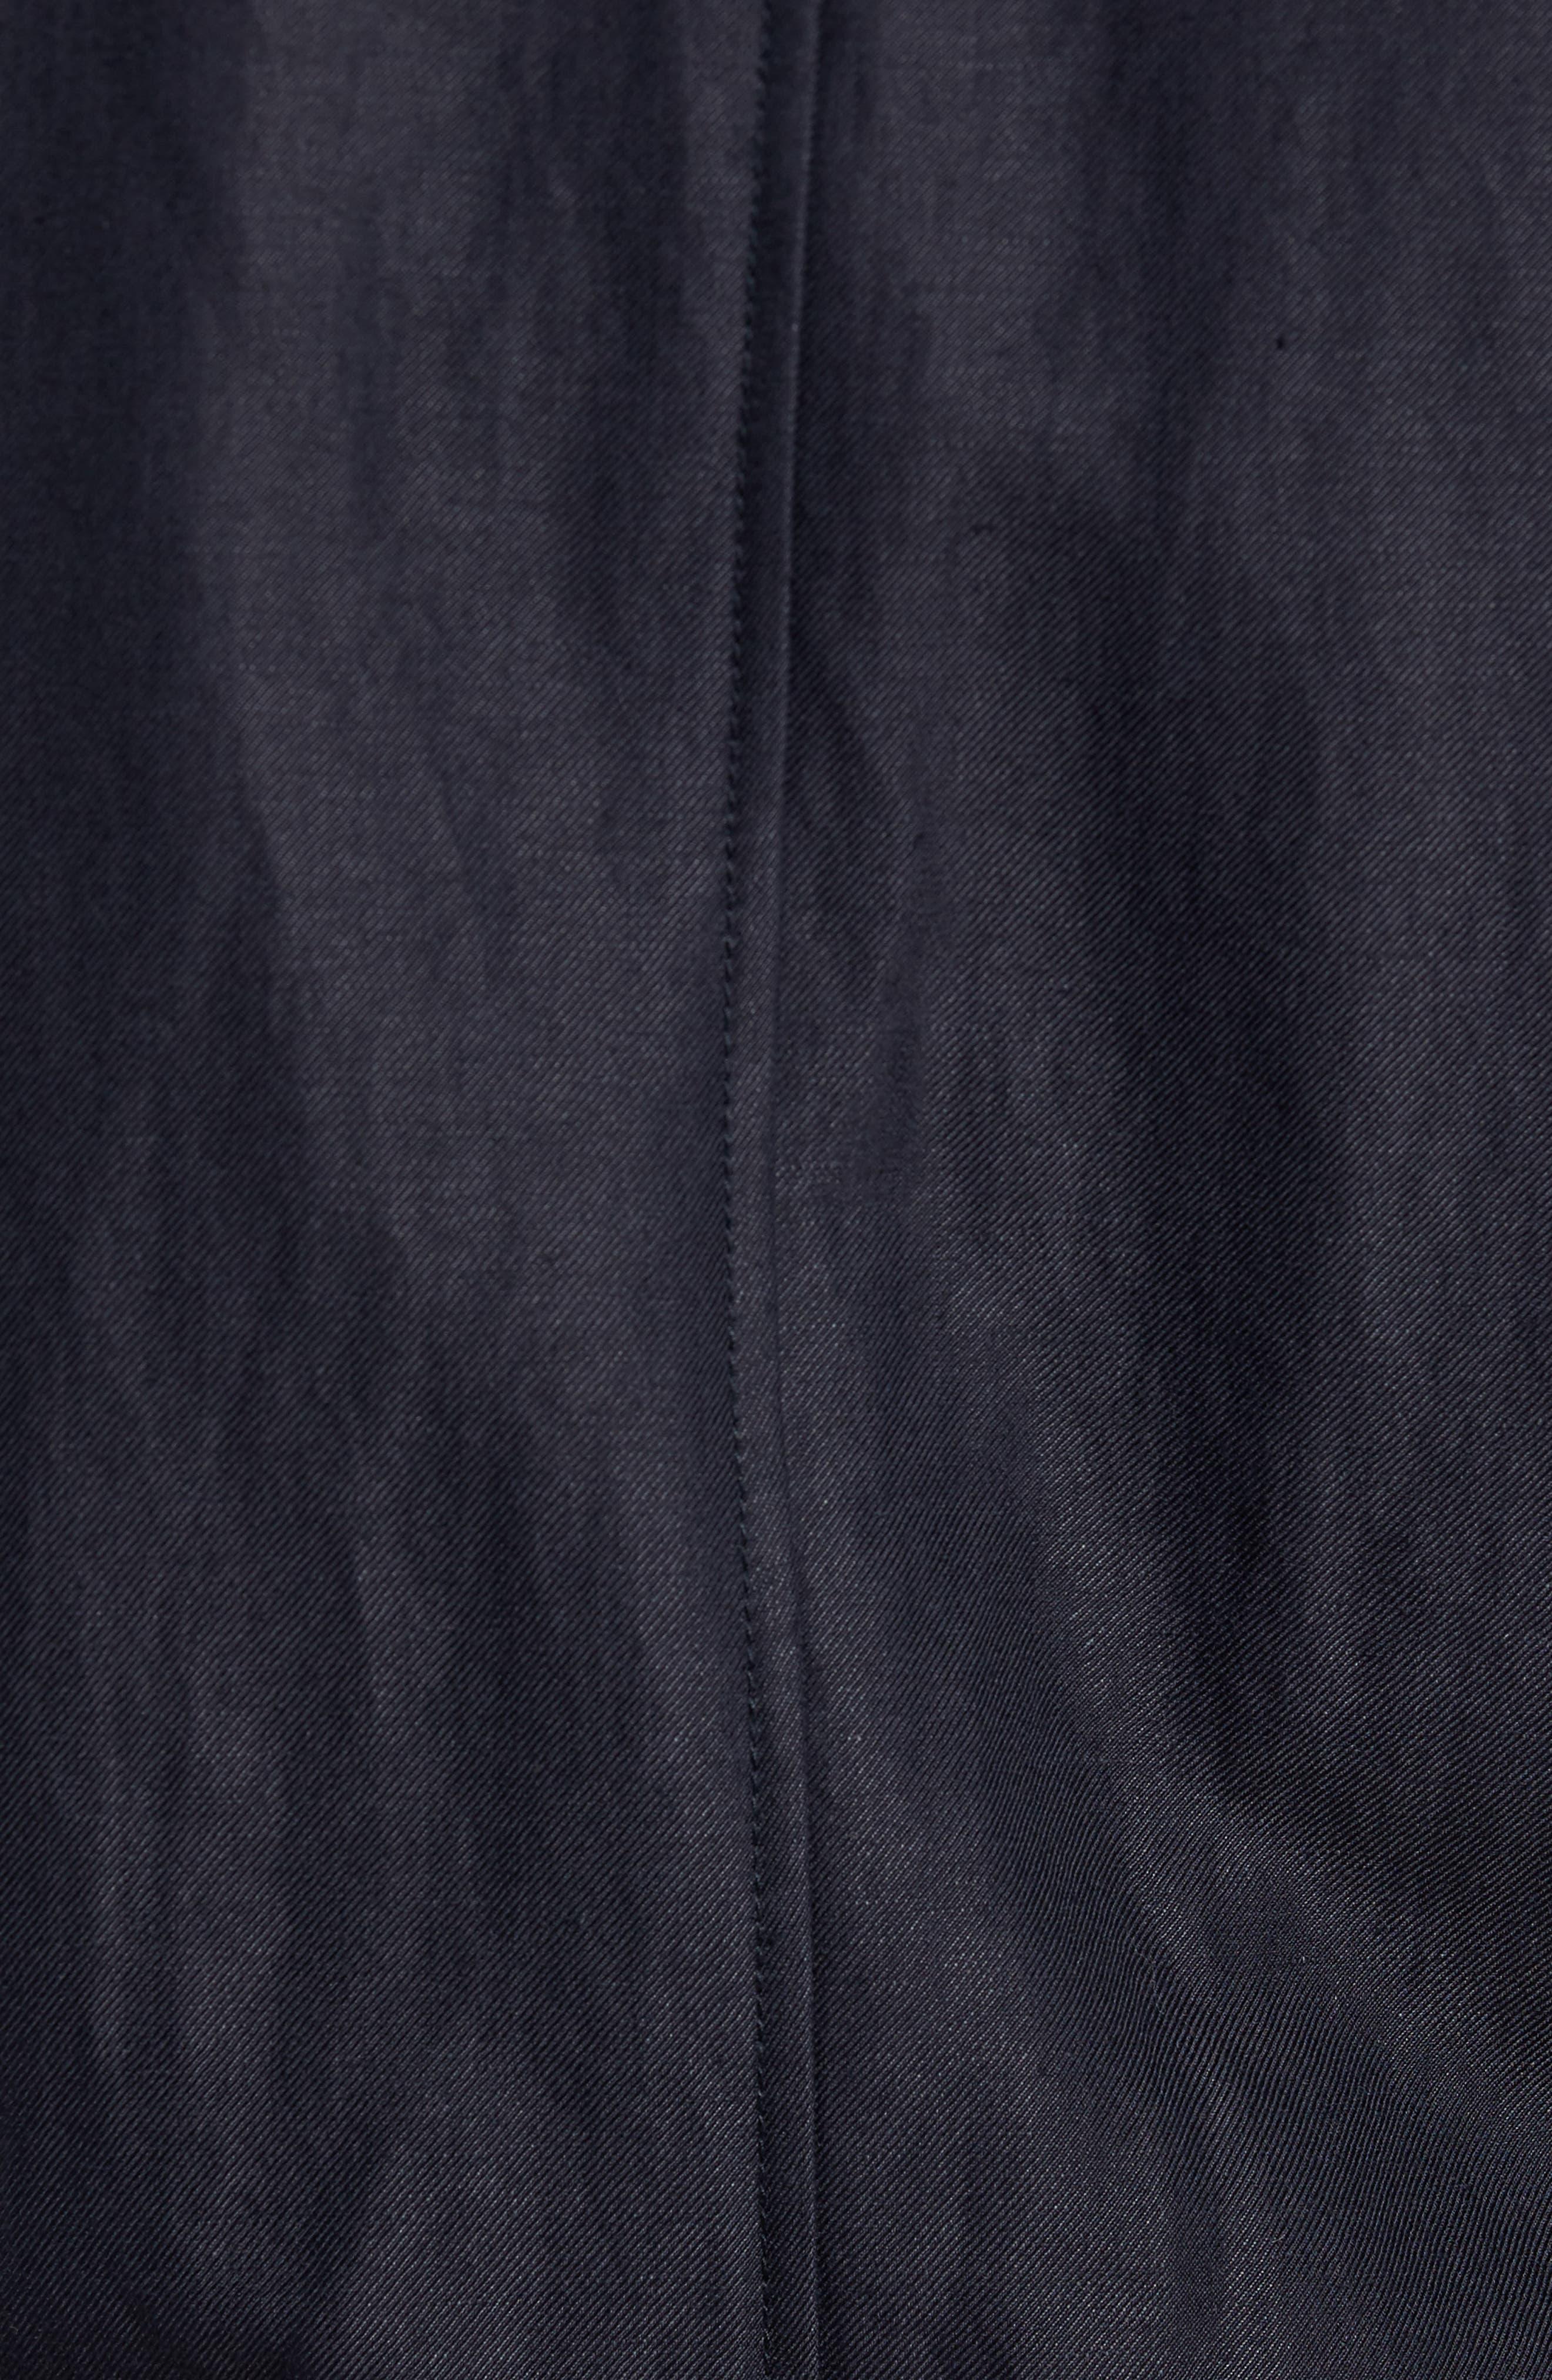 Classic Bomber Jacket,                             Alternate thumbnail 12, color,